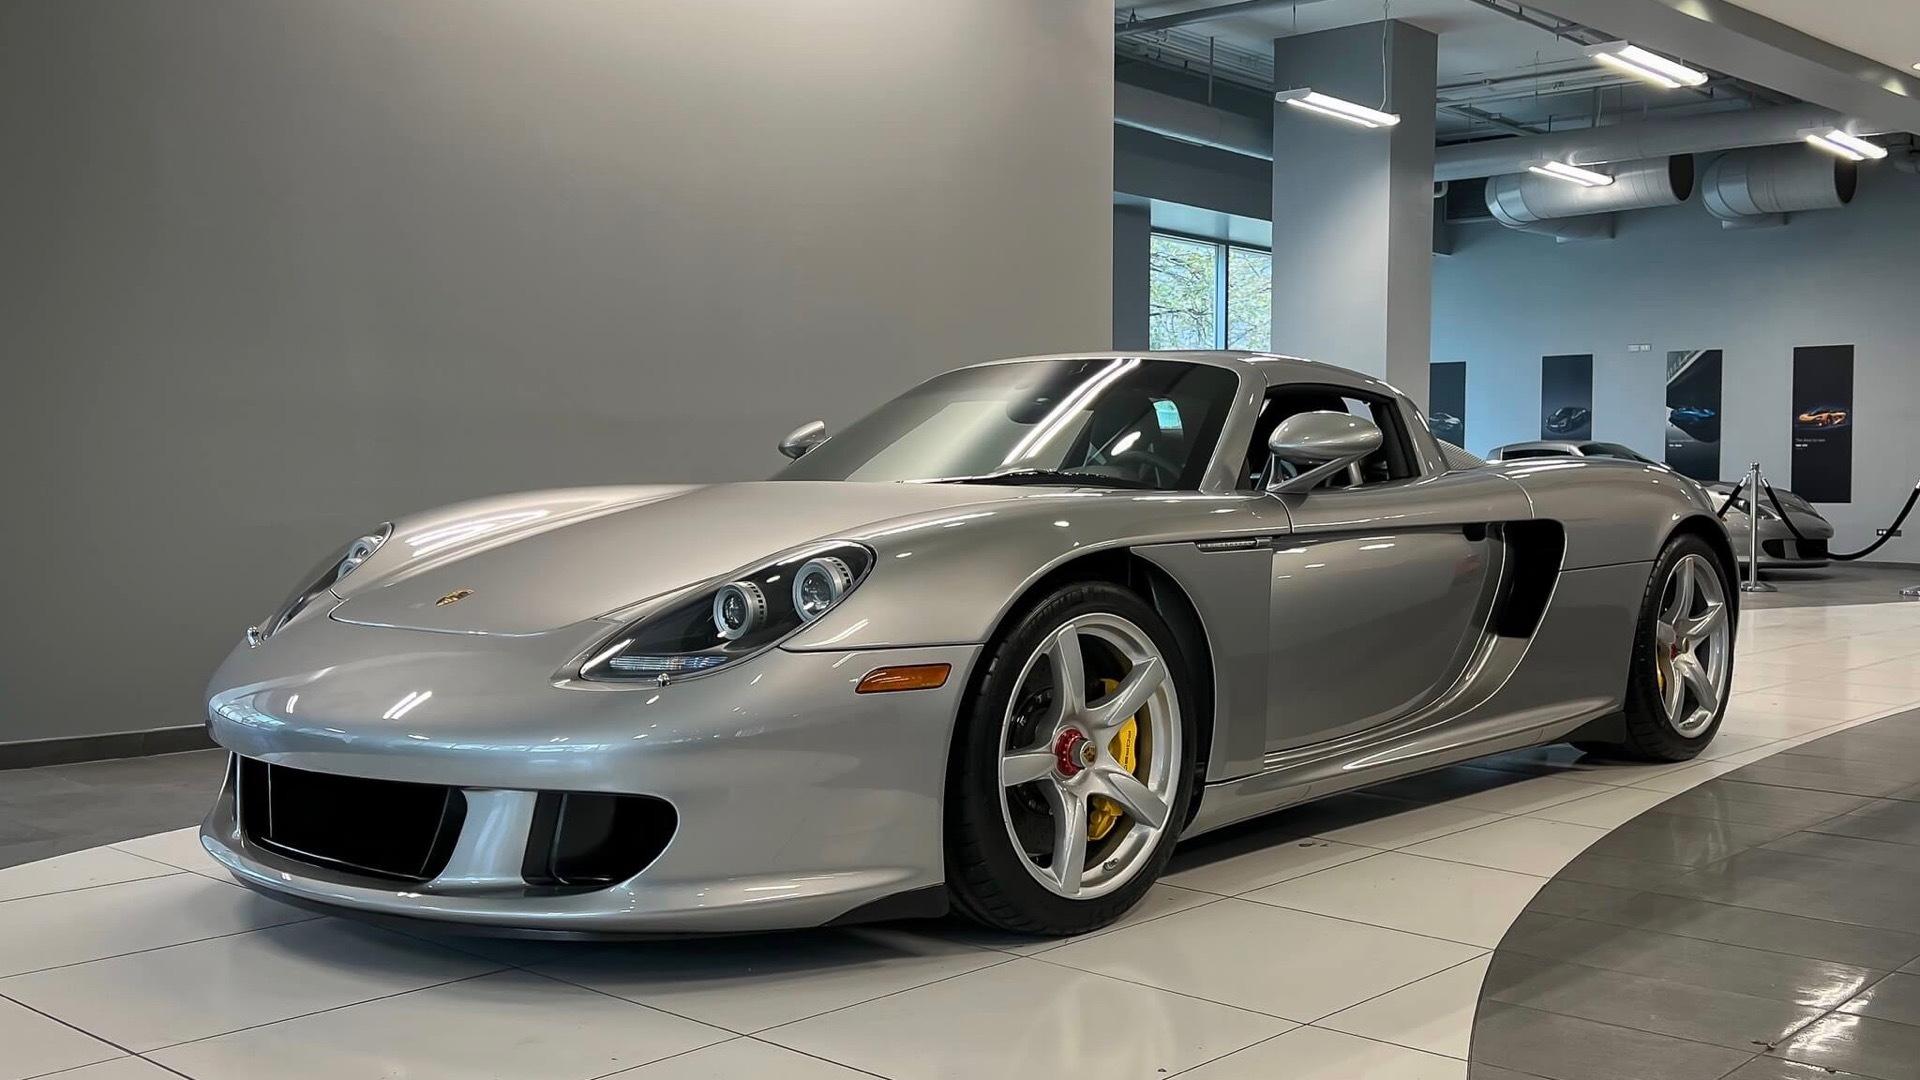 2005 Porsche Carrera GT (photo via P Car Market)